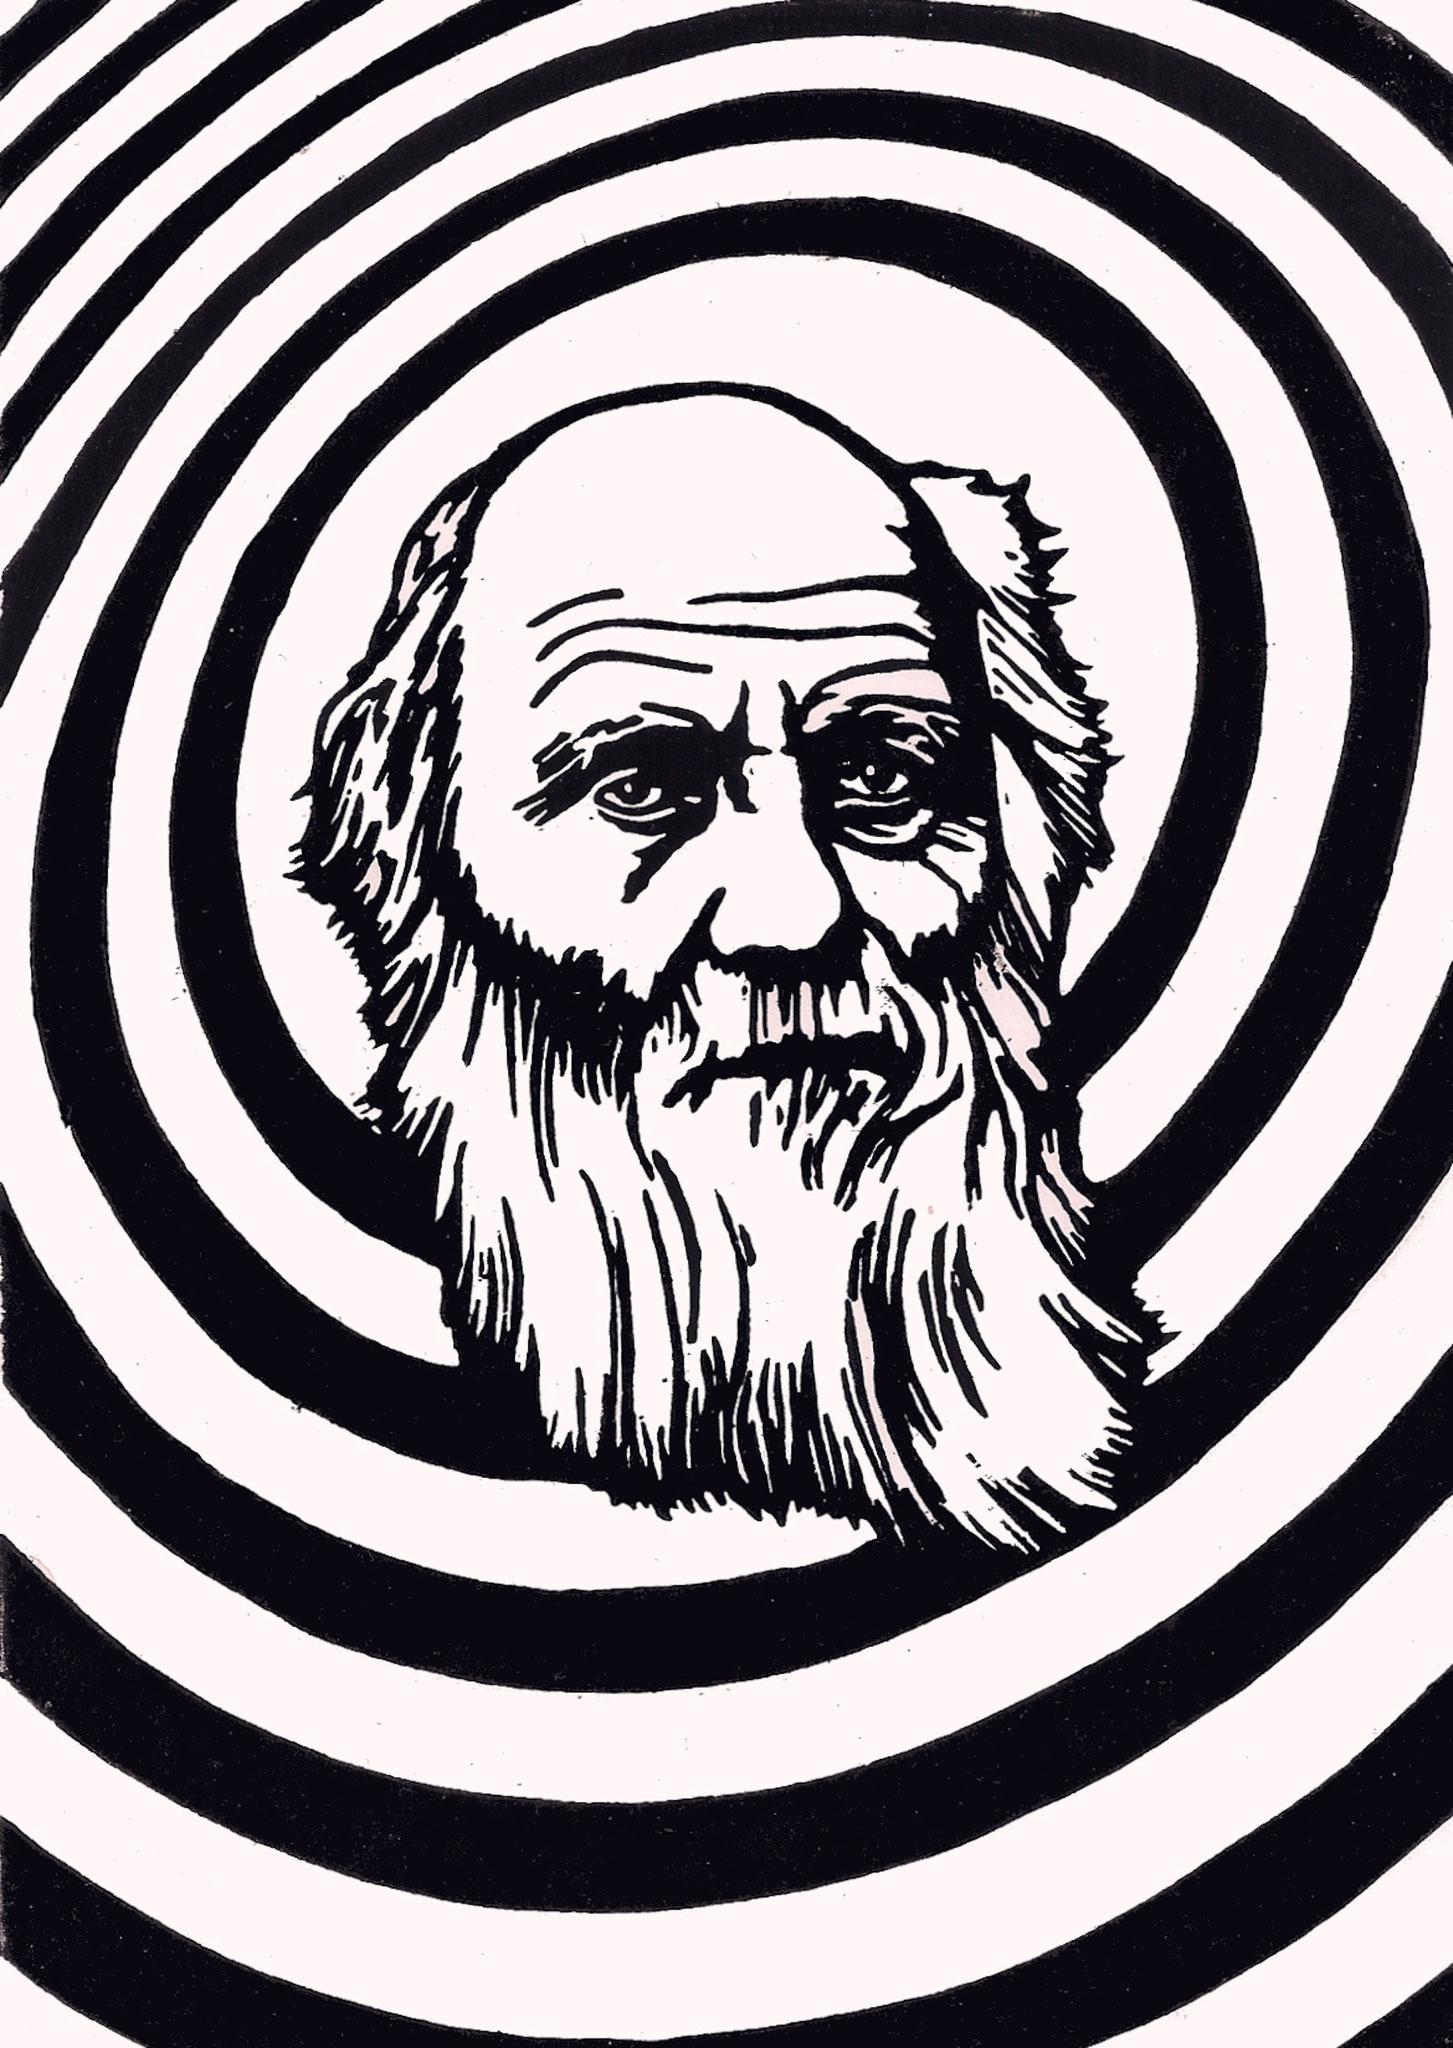 Charles Darwin, 08/11/2017, Edition 5, A5